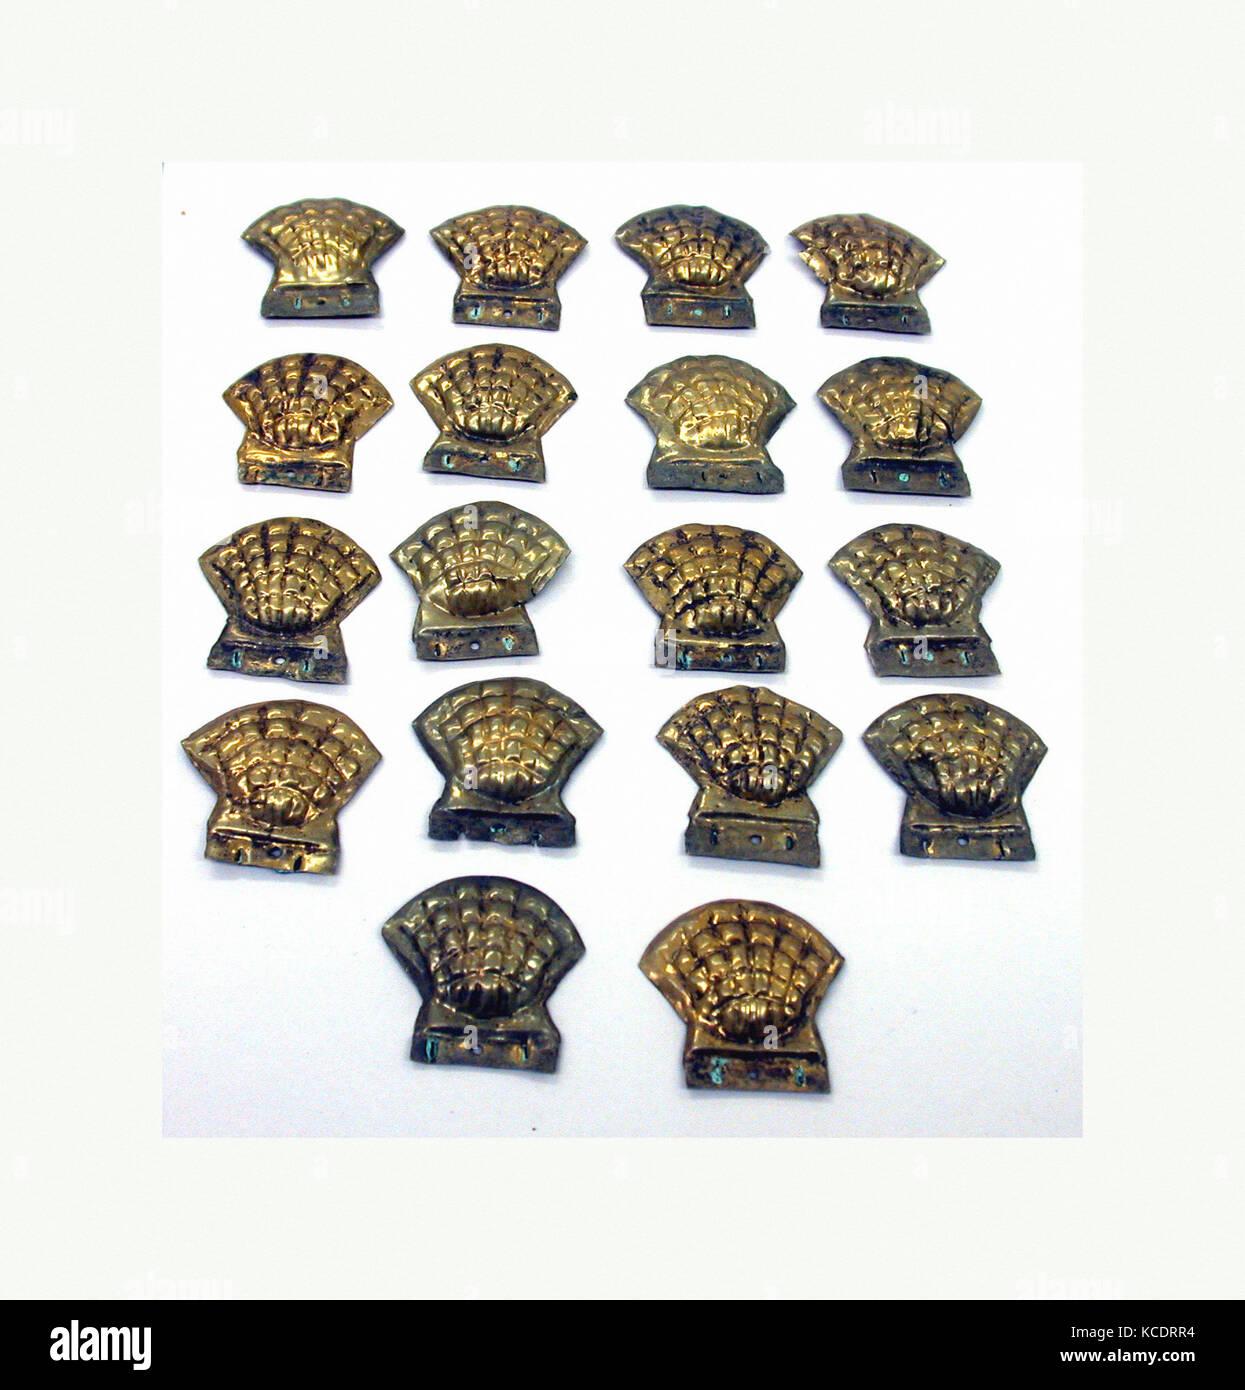 Cockle Shell Ornament, 390–450, Peru, Moche (Loma Negra), Gilded copper, Height 1-7/16 in. (3.7 cm), Metal-Ornaments - Stock Image